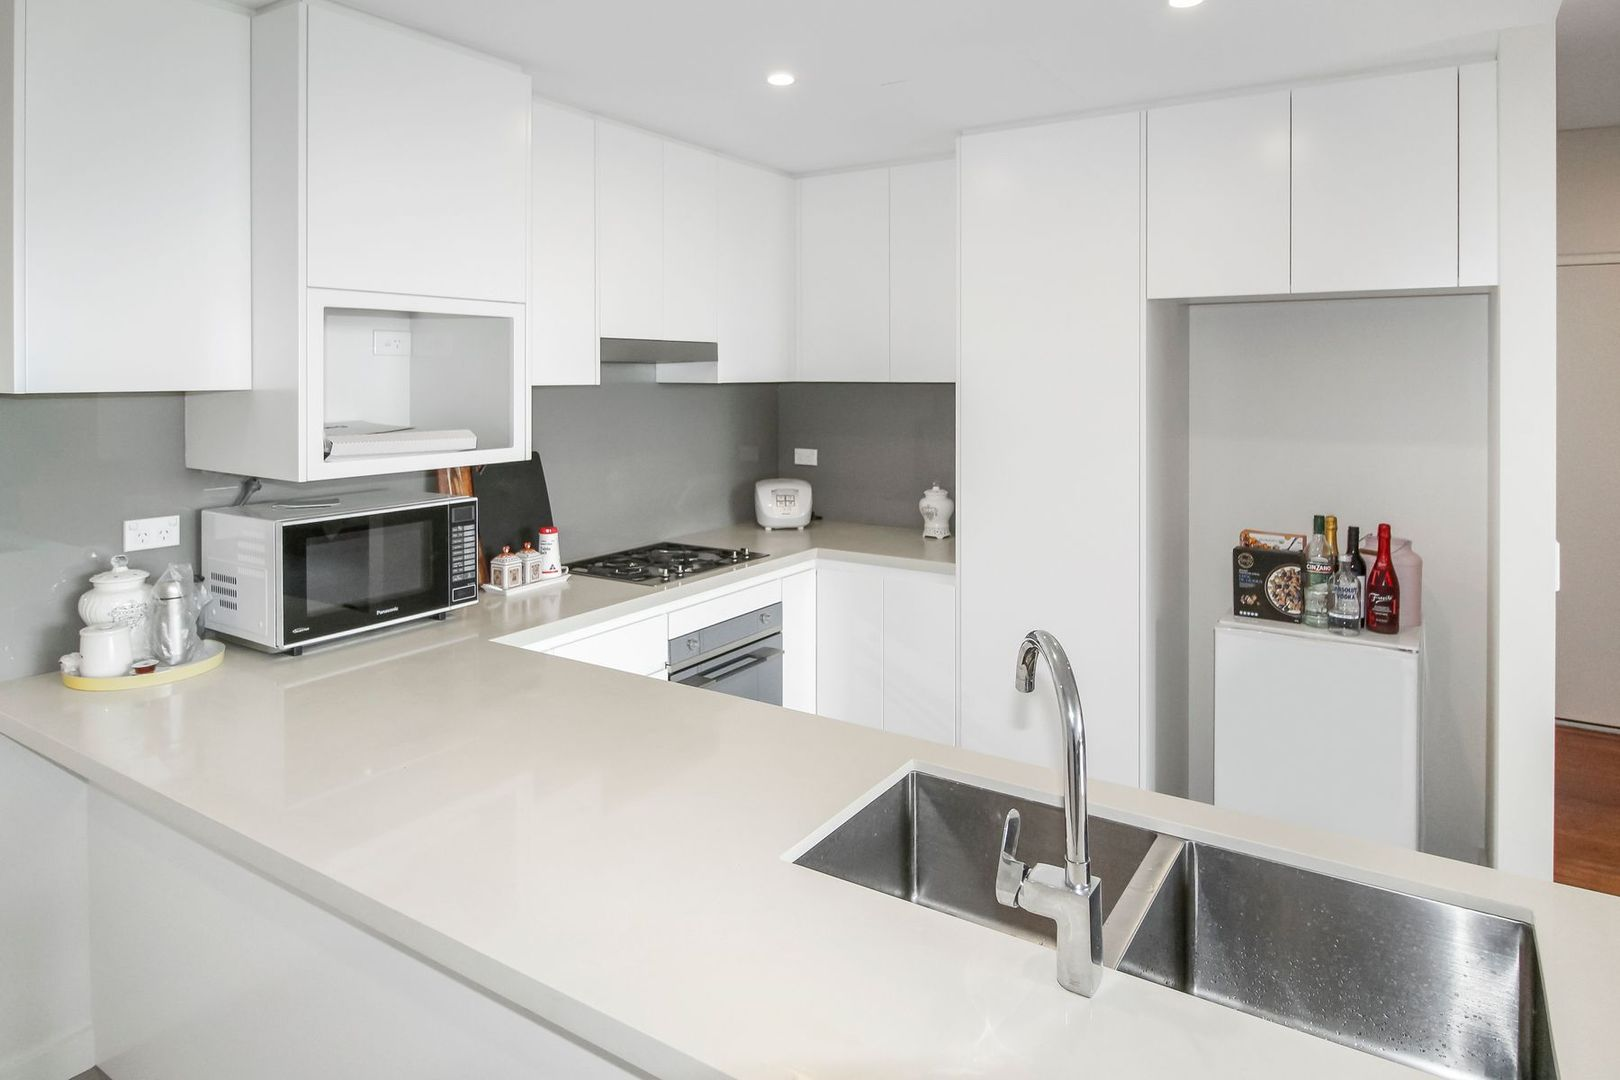 C58/1-9 Monash Road, Gladesville NSW 2111, Image 1